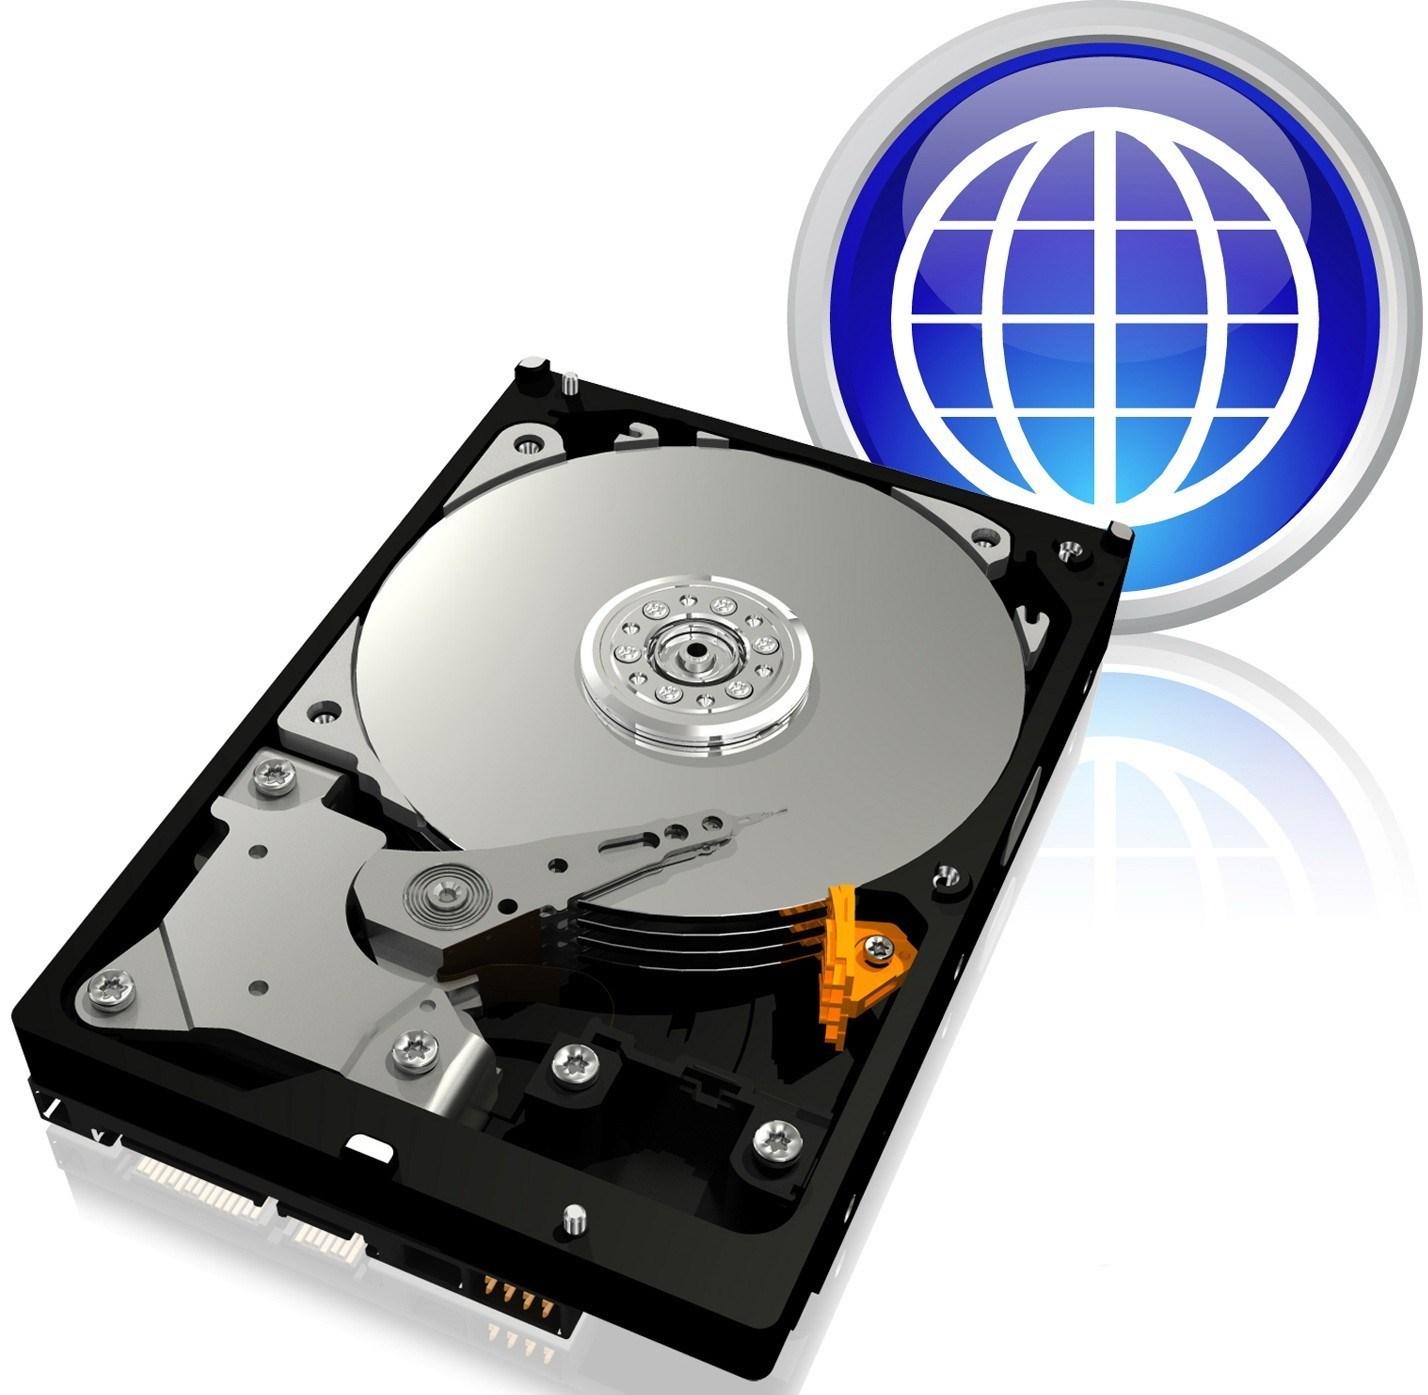 Western Digital Blue Wd5000azlx 500gb 35 Sata 60gb S Hard Drive Hardisk Internal Pc Wd